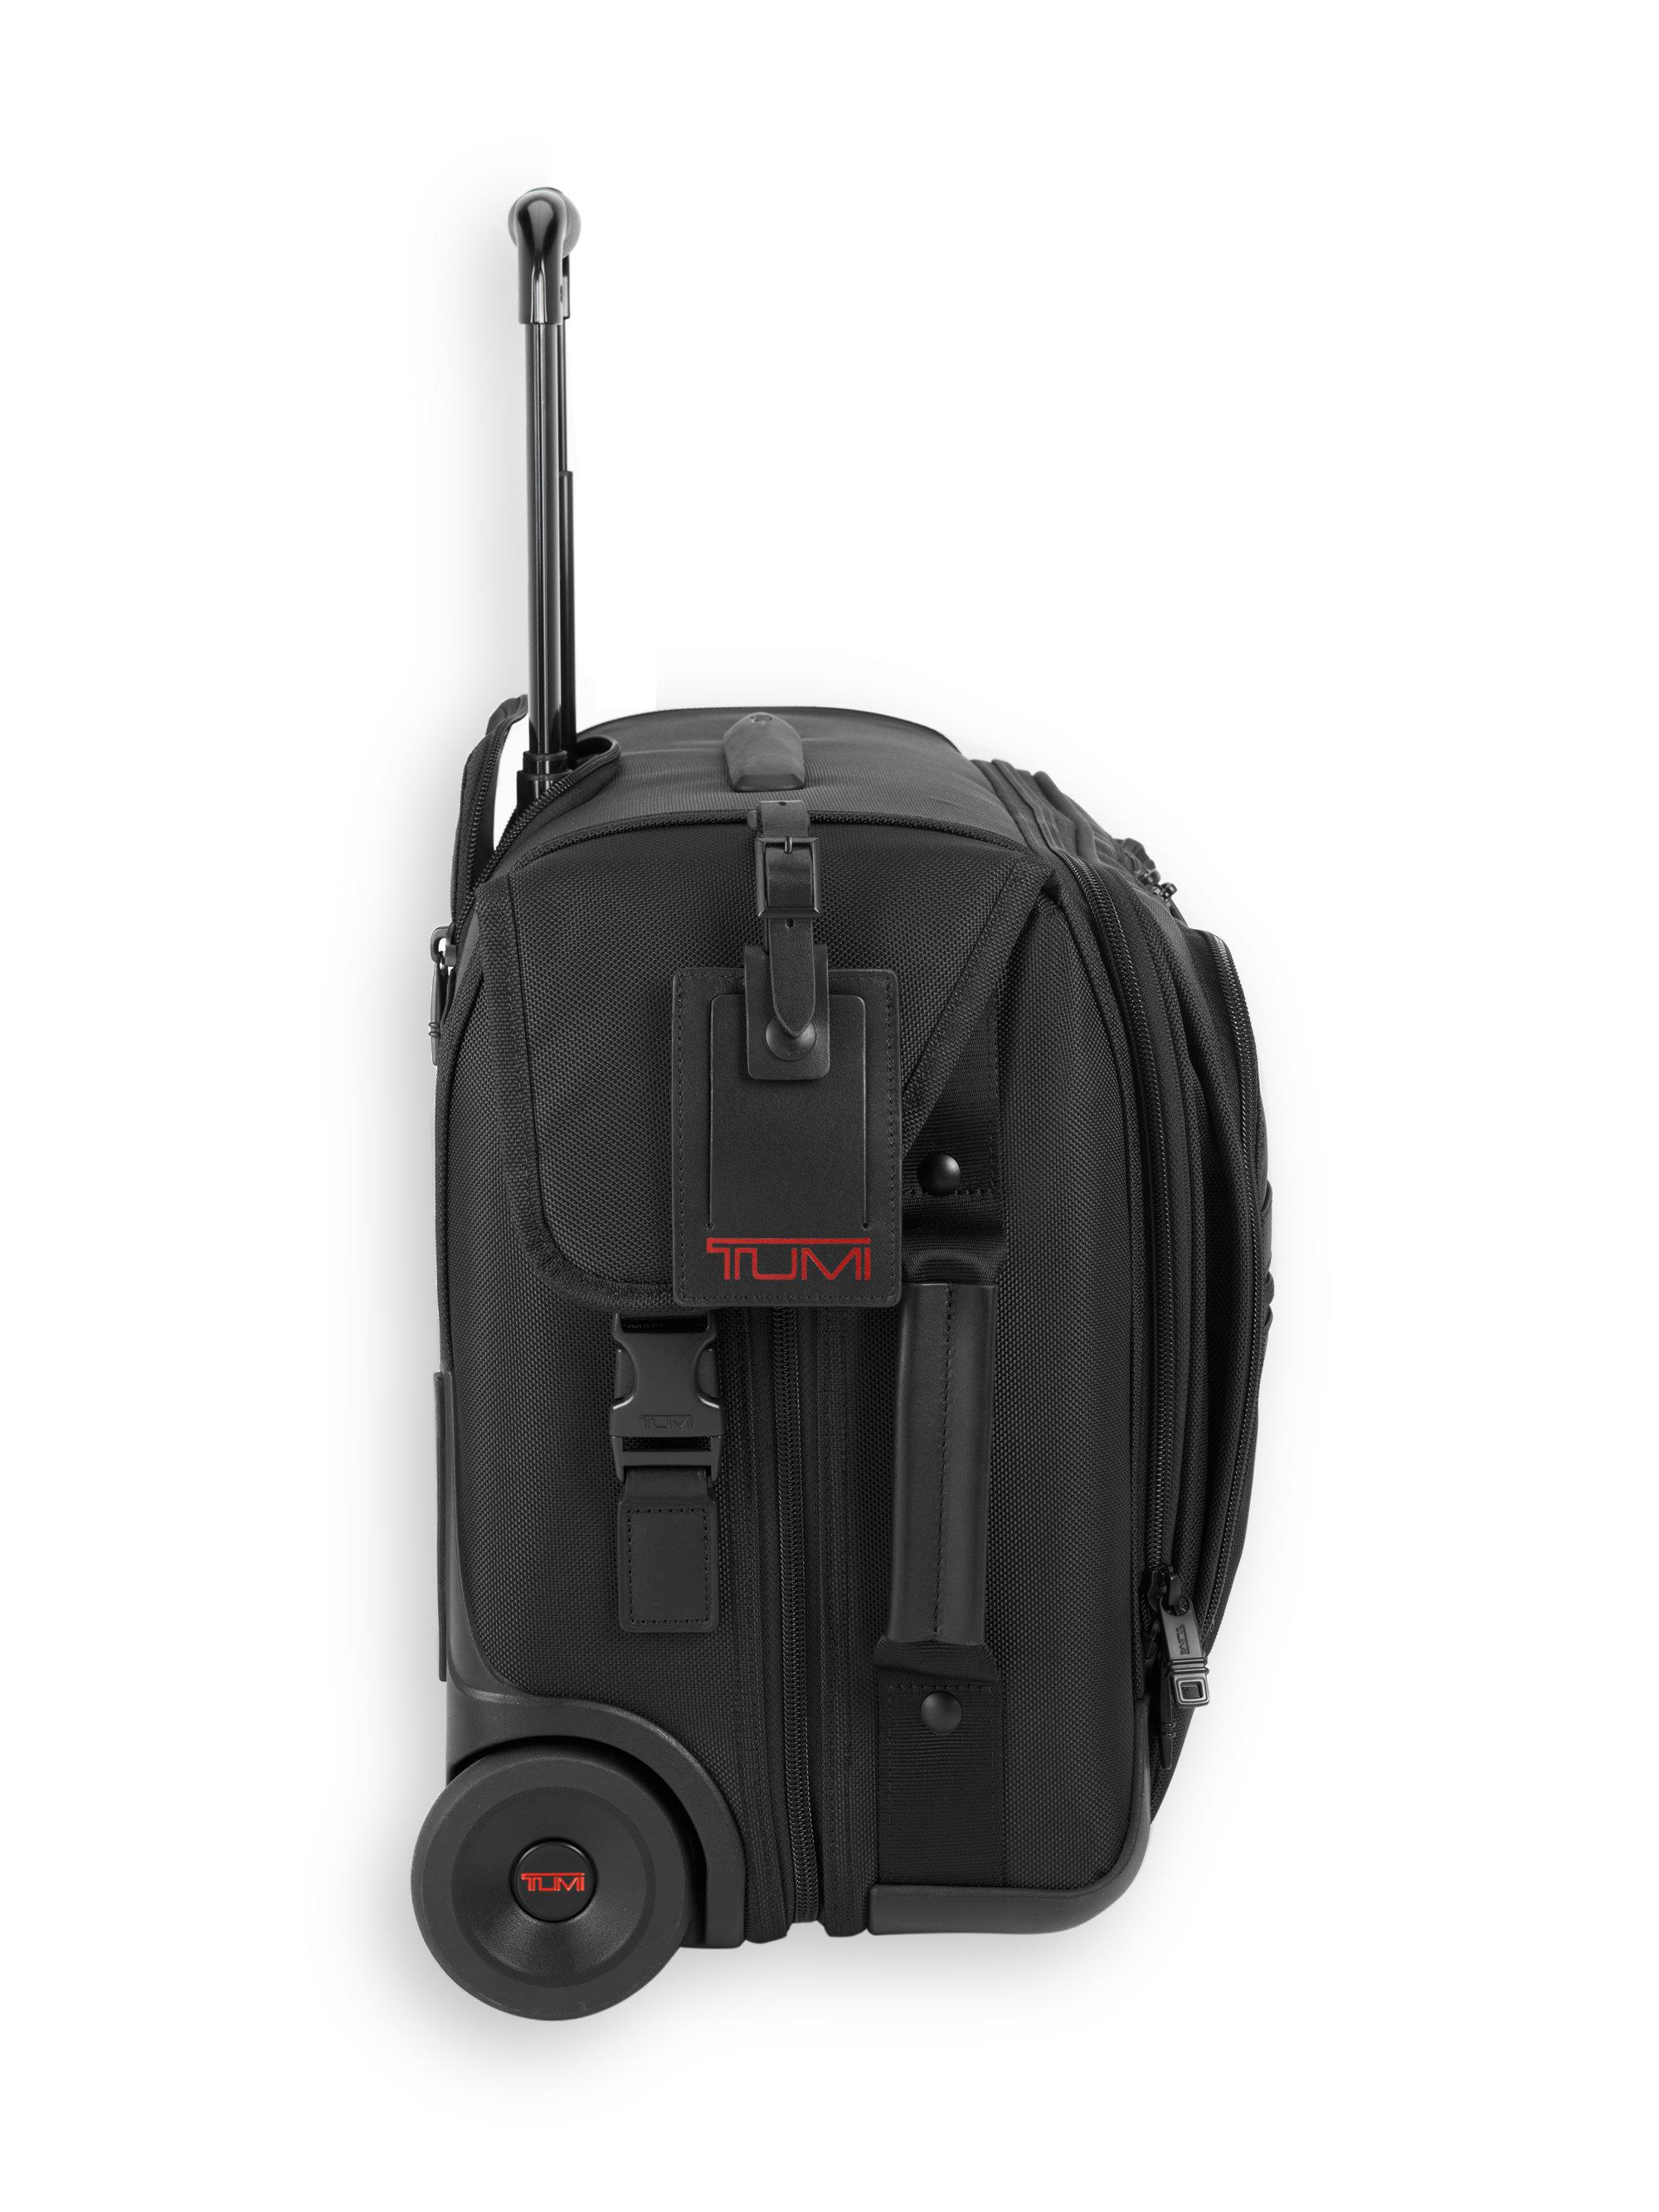 Lyst - Tumi Alpha 2 Wheeled Carry-on Garment Bag in Black for Men b88e528ac5